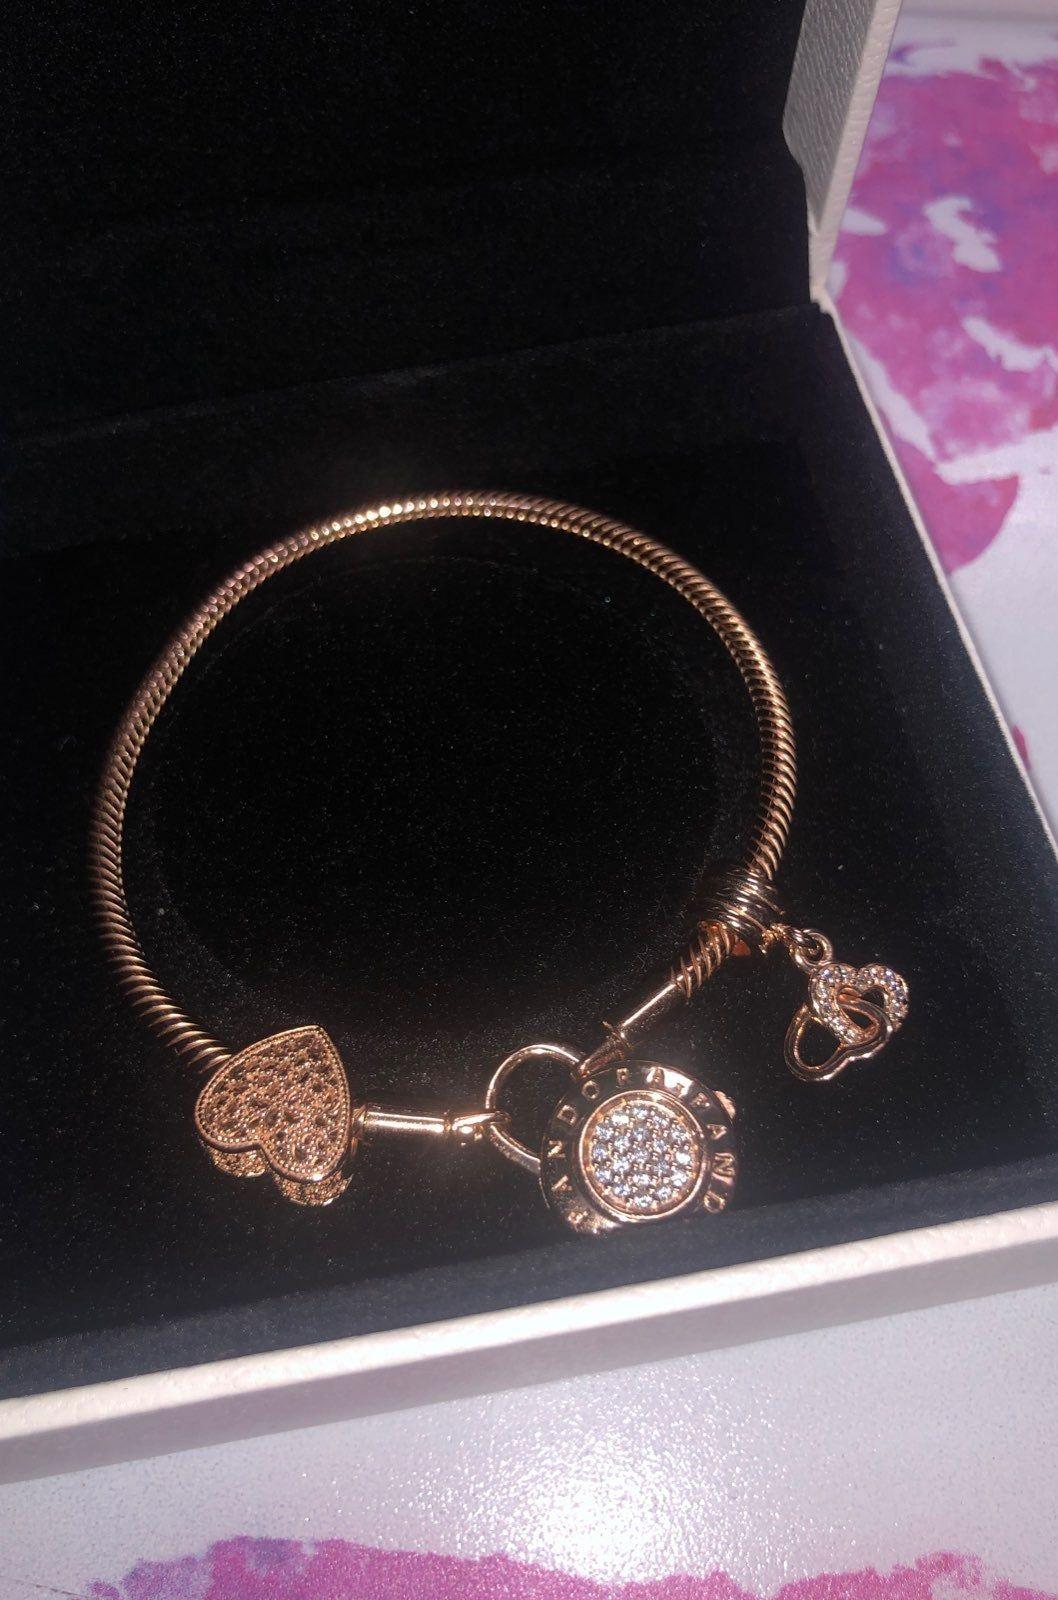 How Much Are Pandora Bracelets Worth : pandora, bracelets, worth, Pandora, Padlock, Bracelet, Charms, Retails, Filigree, Bea…, Jewelry, Charms,, Designs,